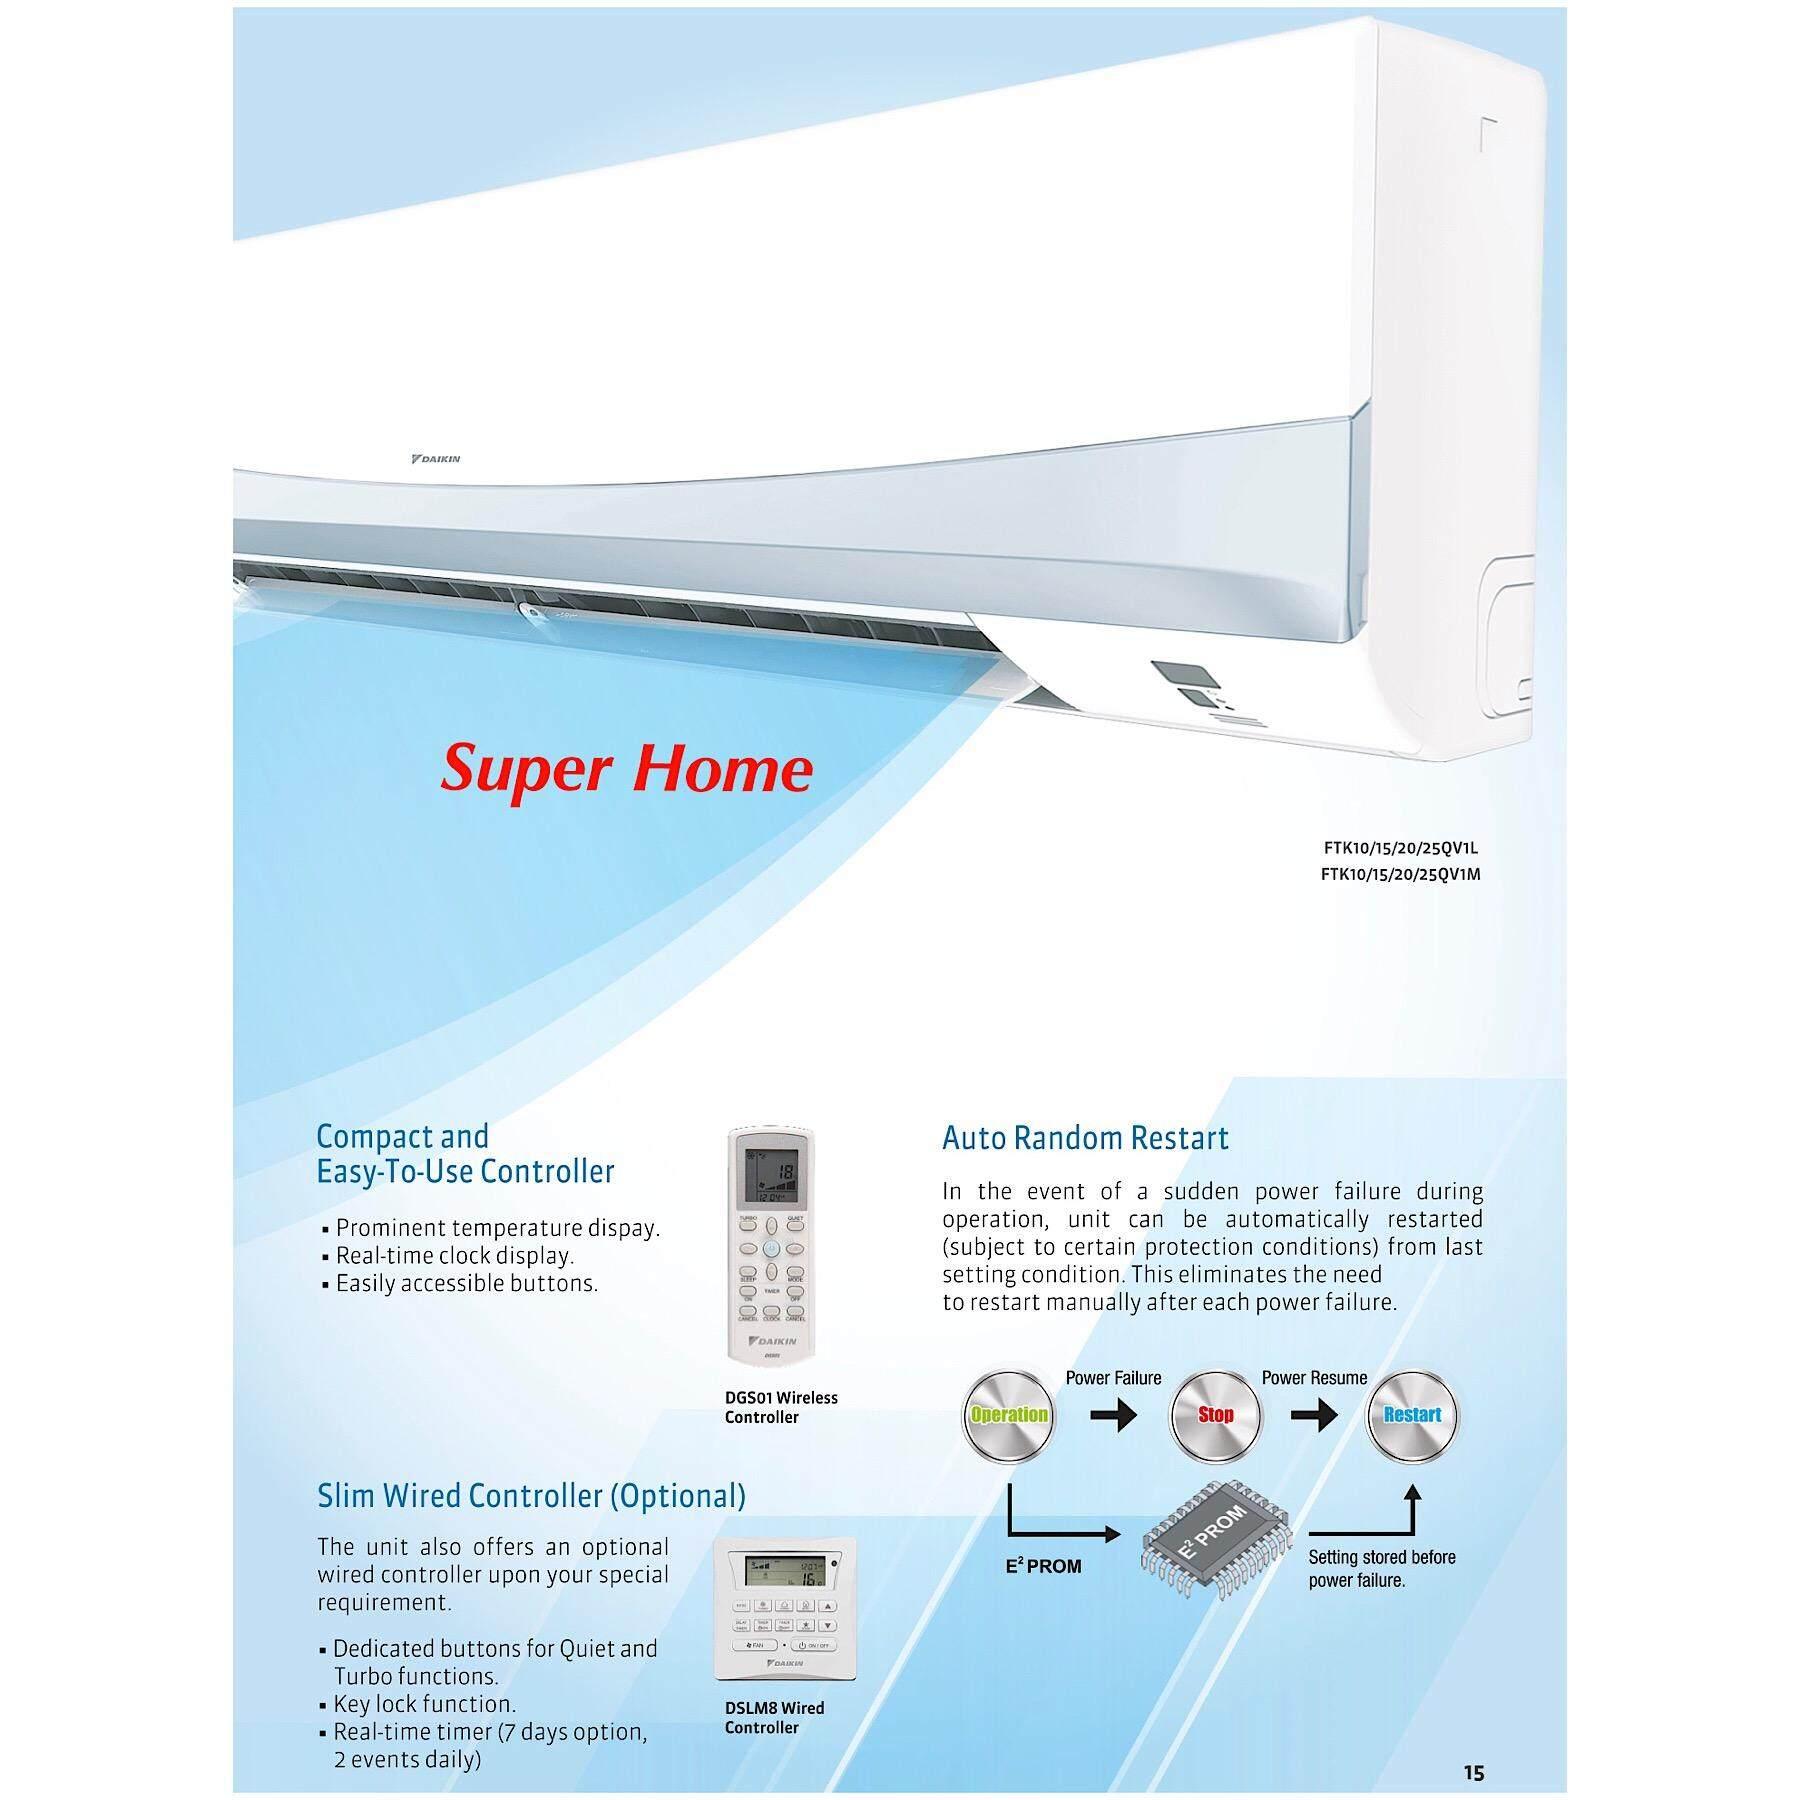 Daikin FTK20Q & RK20C 2 0hp Inverter Air Conditioner (R410a) + Towel